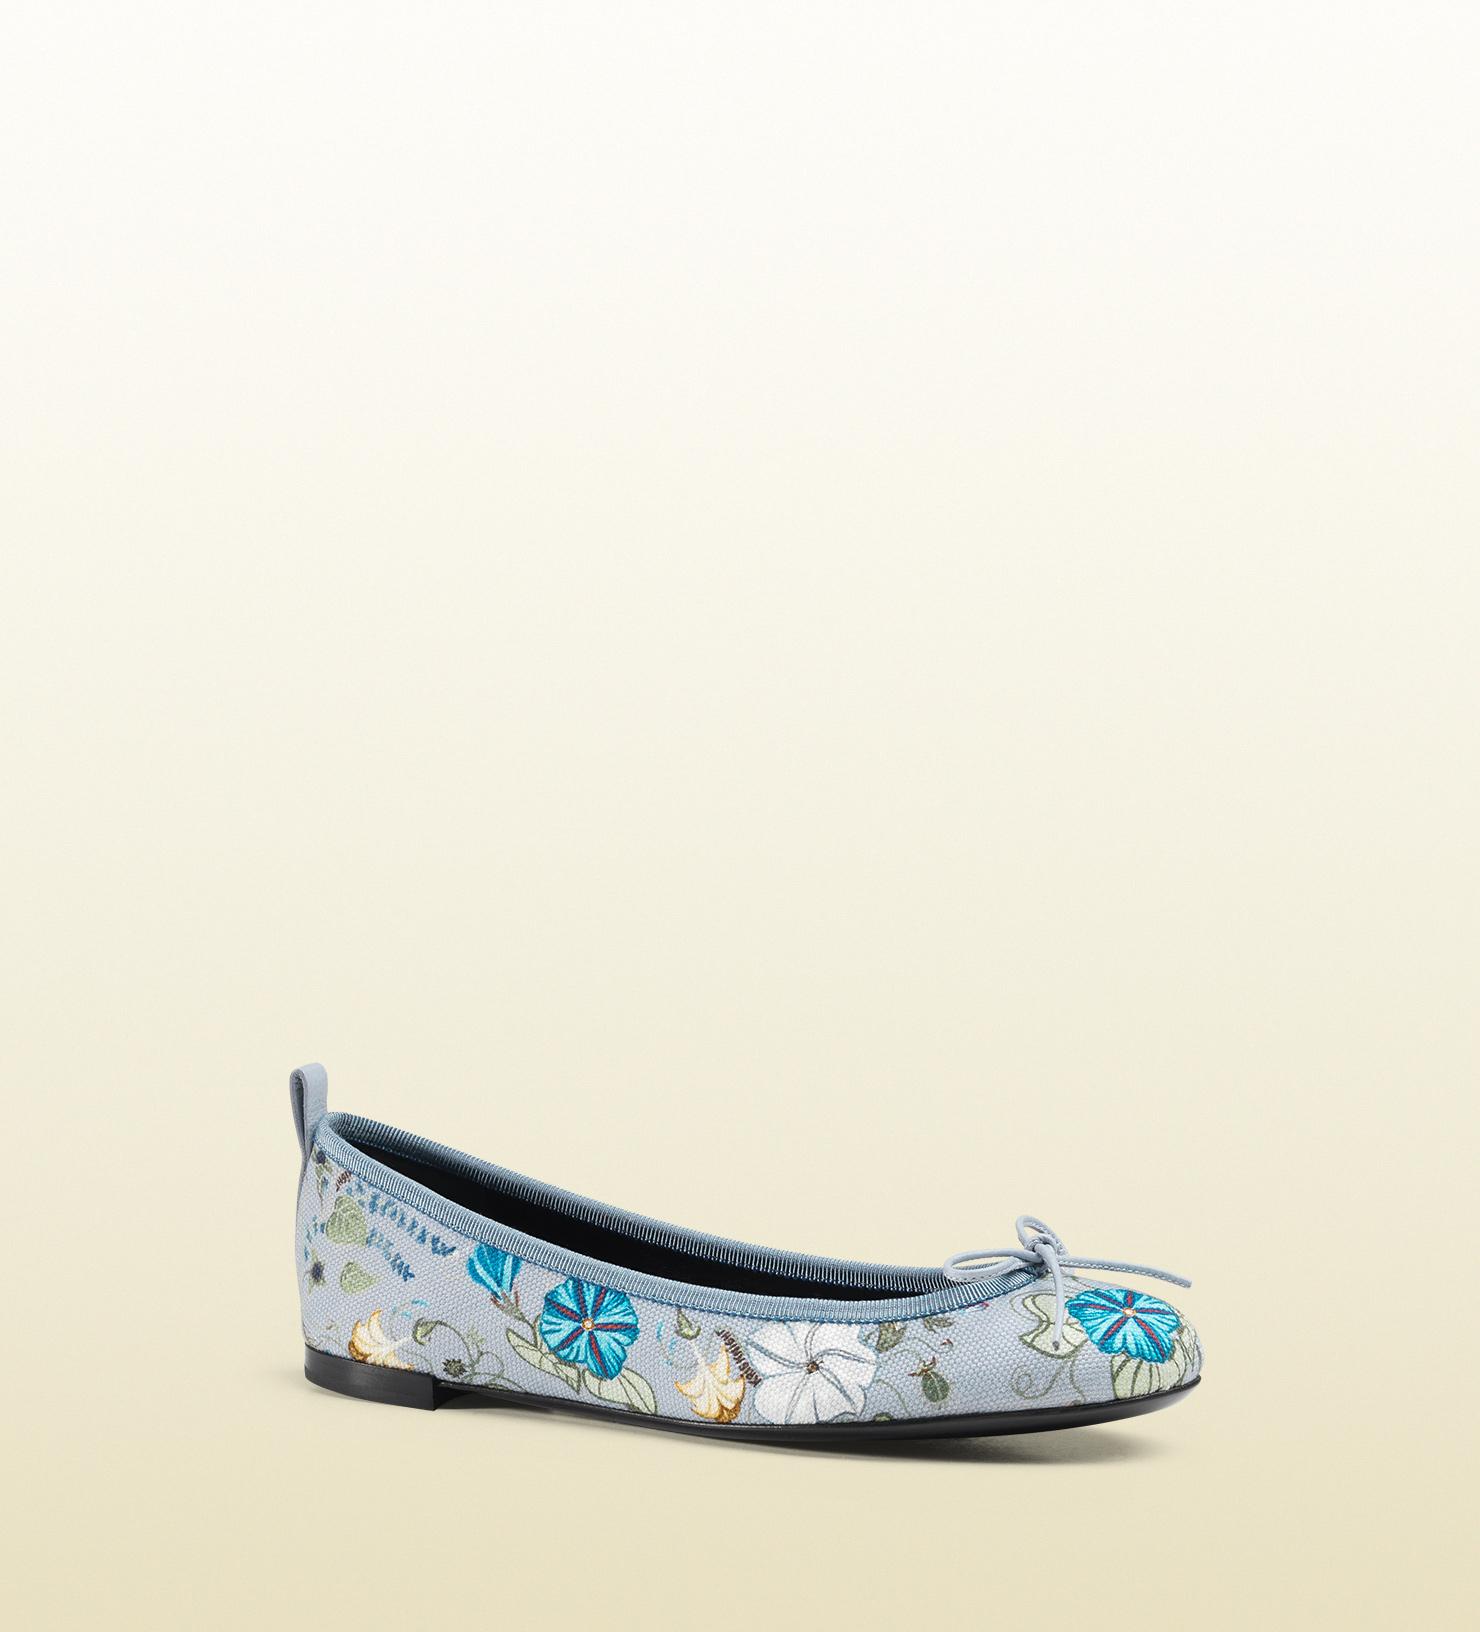 gucci-blue-flora-knight-print-canvas-ballet-flat-product-1-24836984-3-284978704-normal.jpg